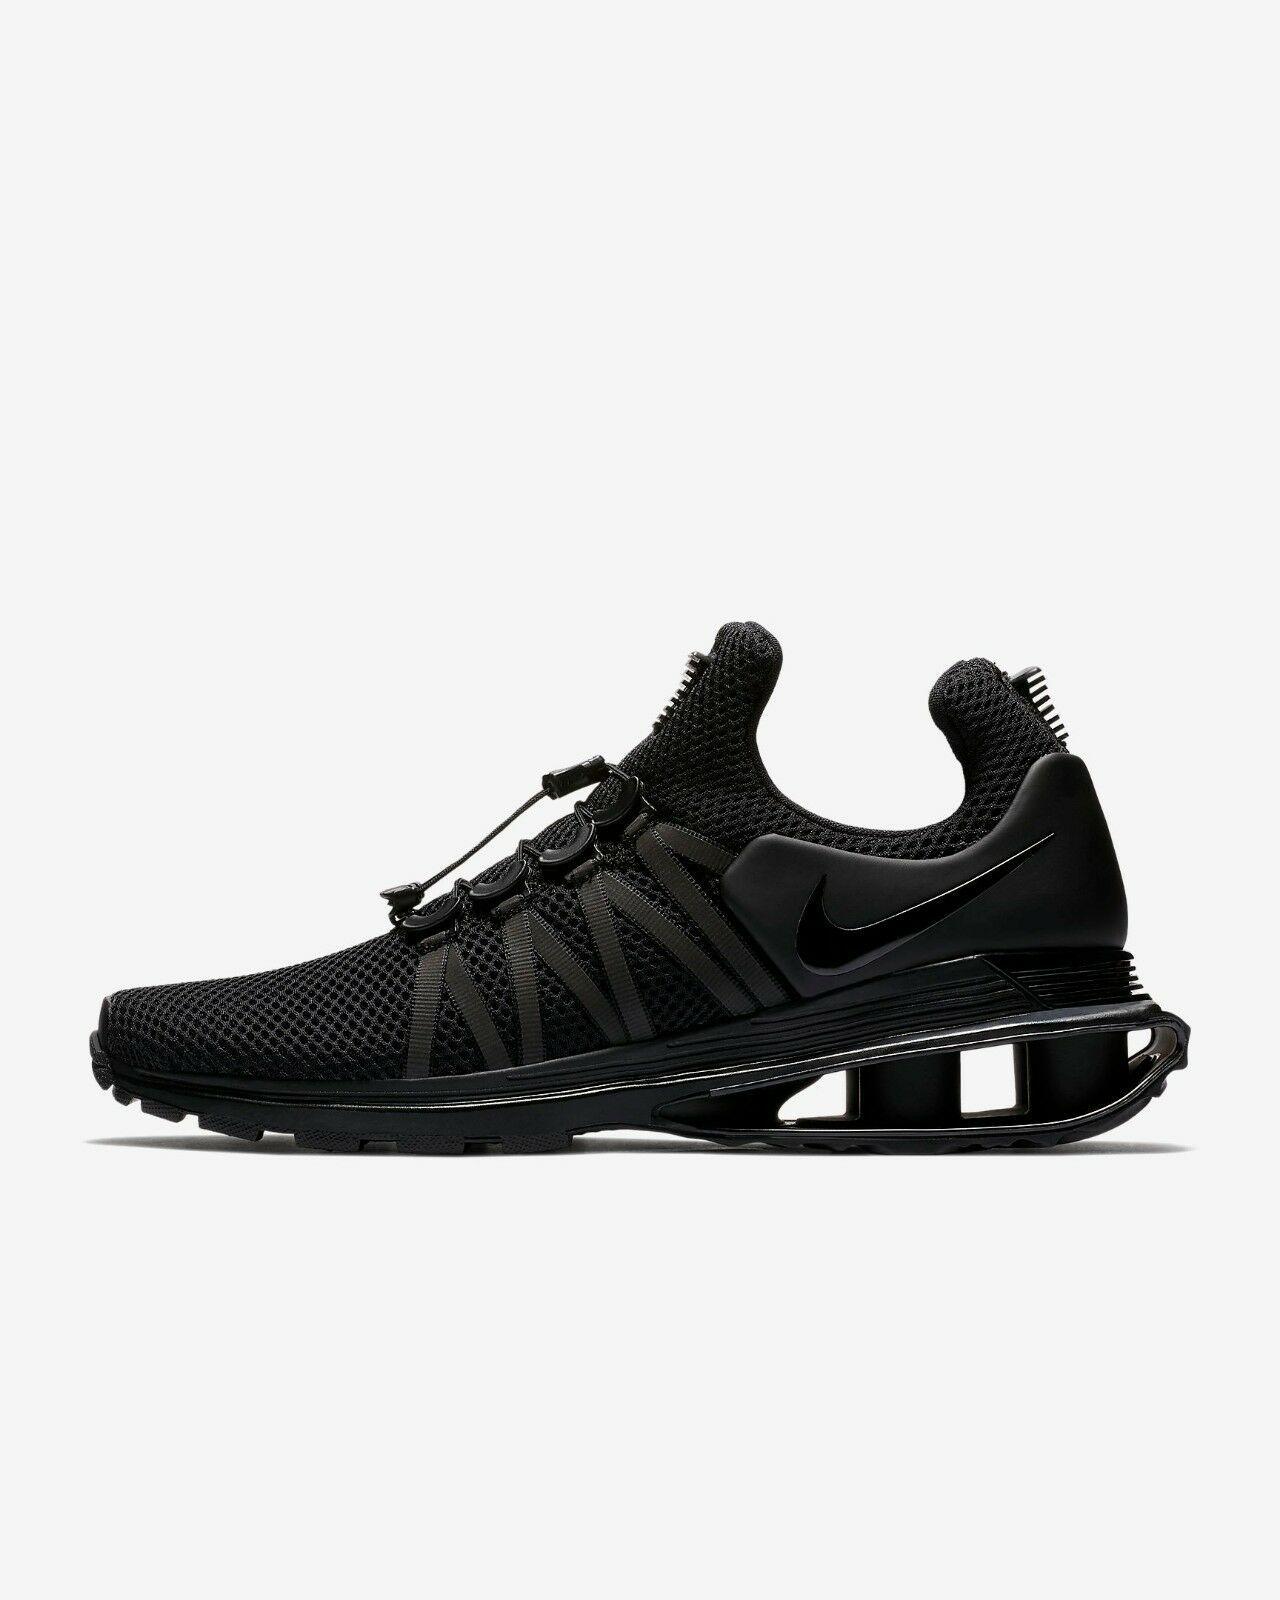 e9172e0ff00 Men s New Authentic Nike Shox Gravity Shoes and 50 similar items. 57